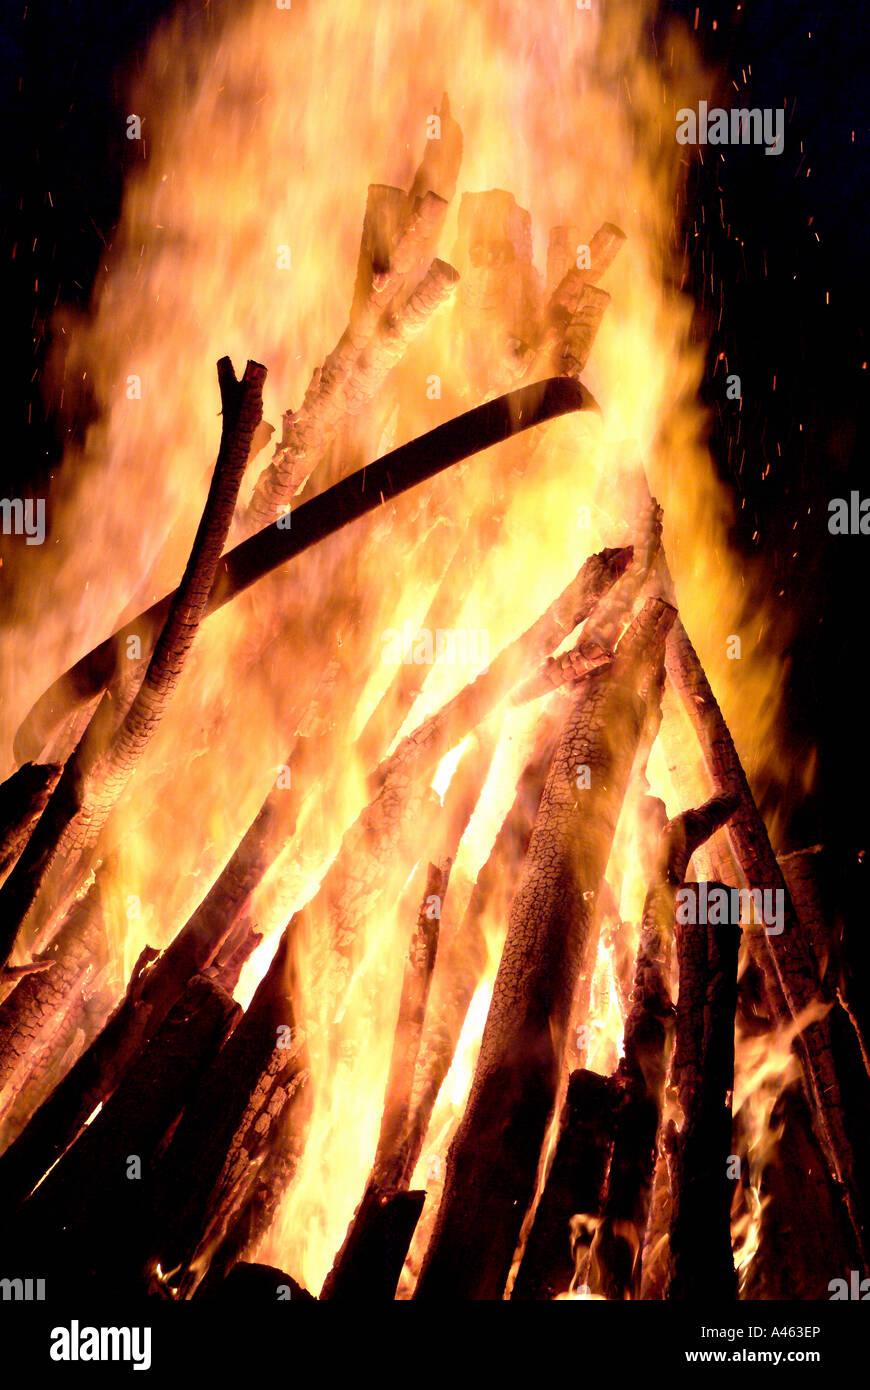 A bonfire - Stock Image